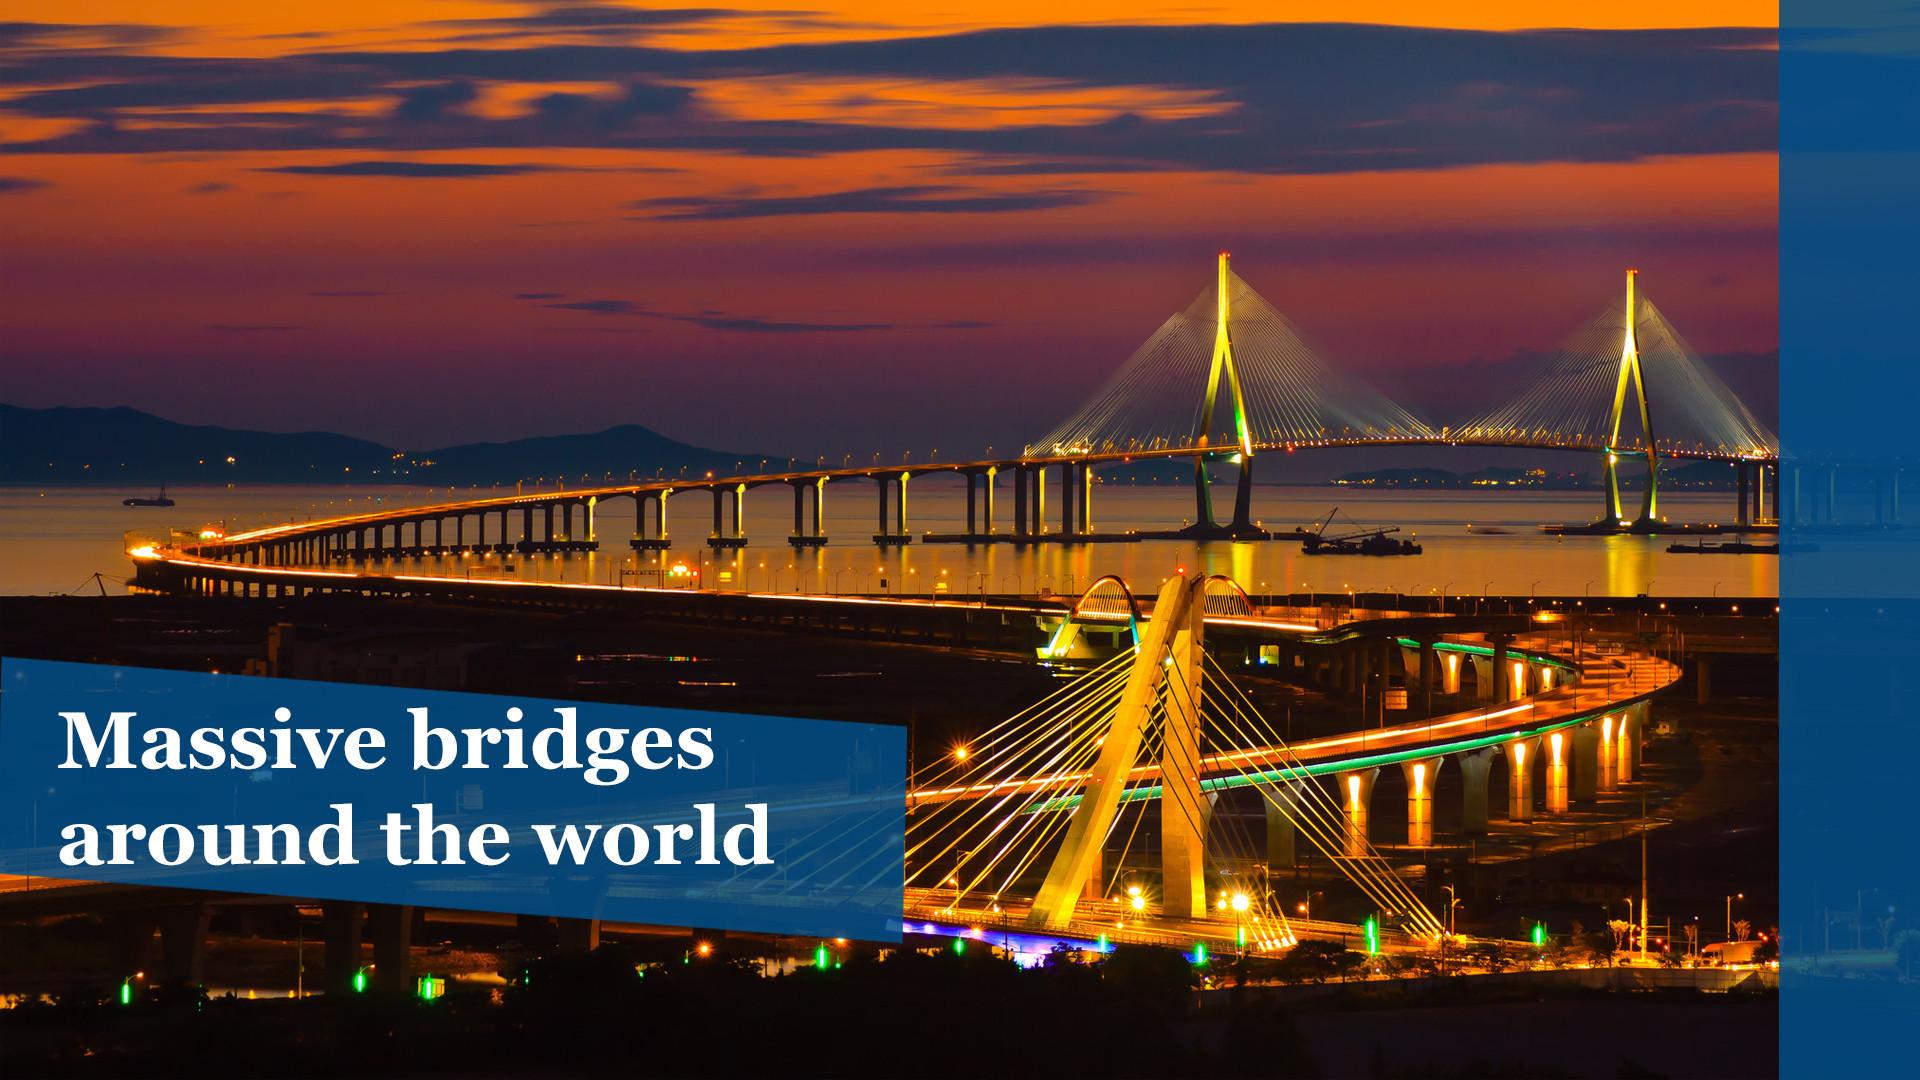 Massive bridges around the world